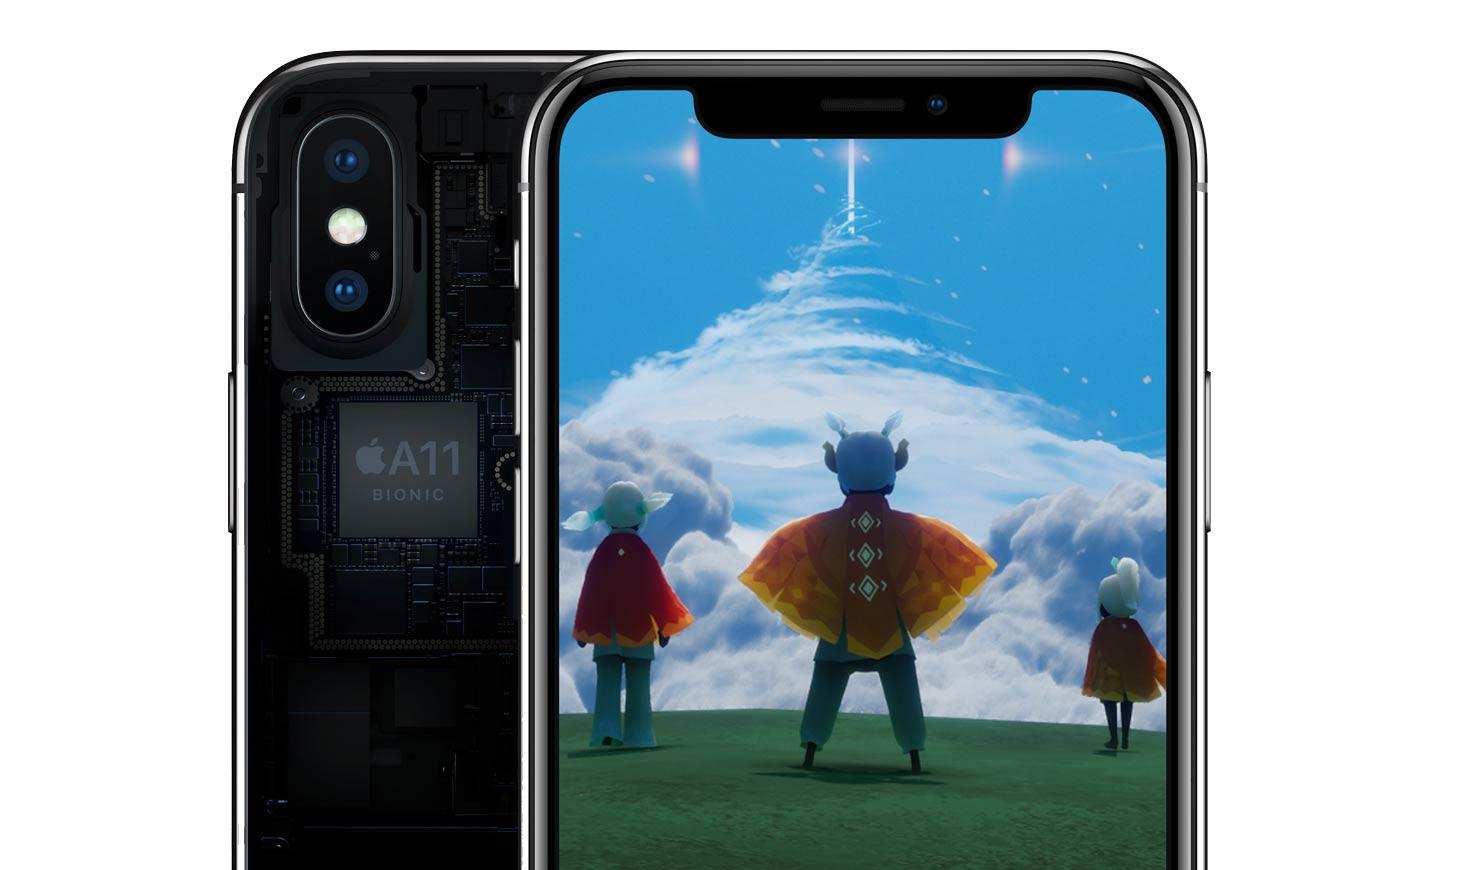 iPhone 8 Plus Apple A11 Bionic